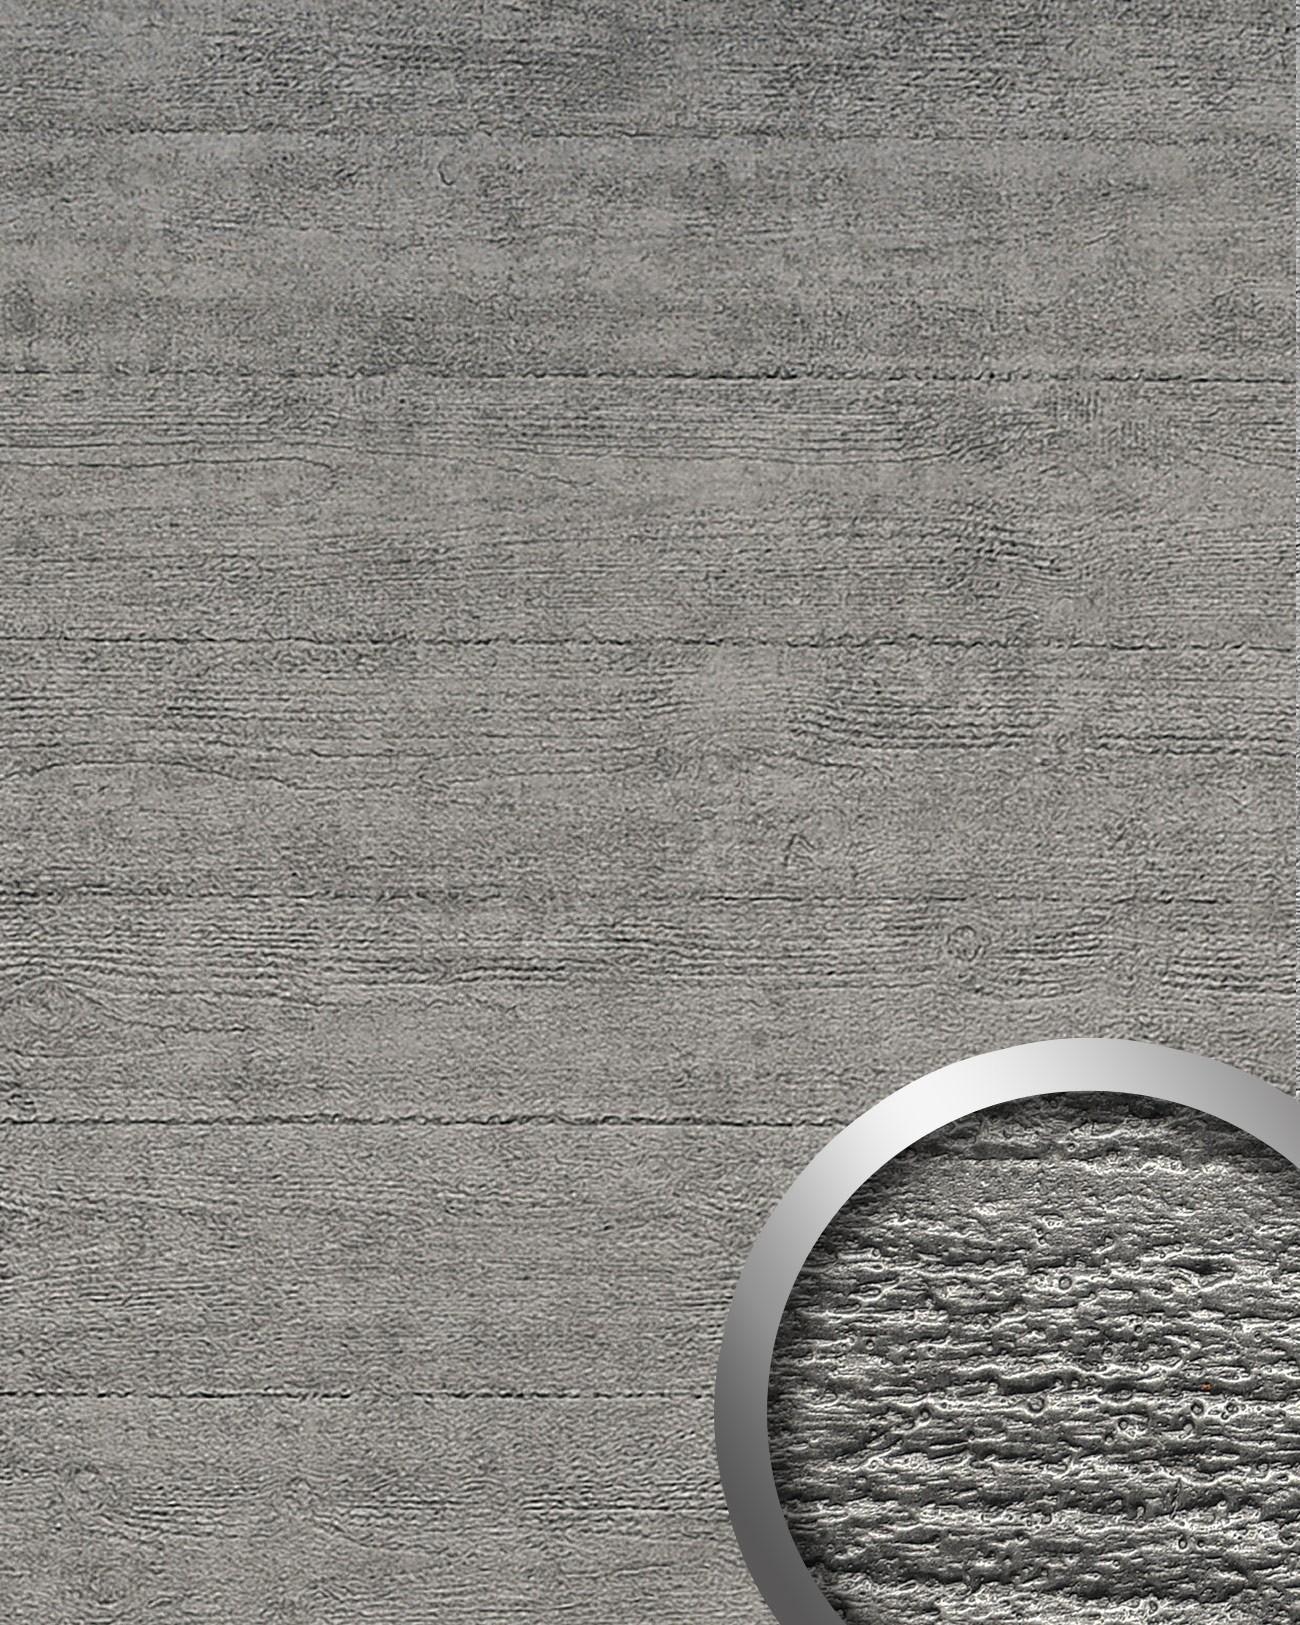 wallface 14803 urban design platte wand paneel beton optik dekor grau 2 60 qm ebay. Black Bedroom Furniture Sets. Home Design Ideas